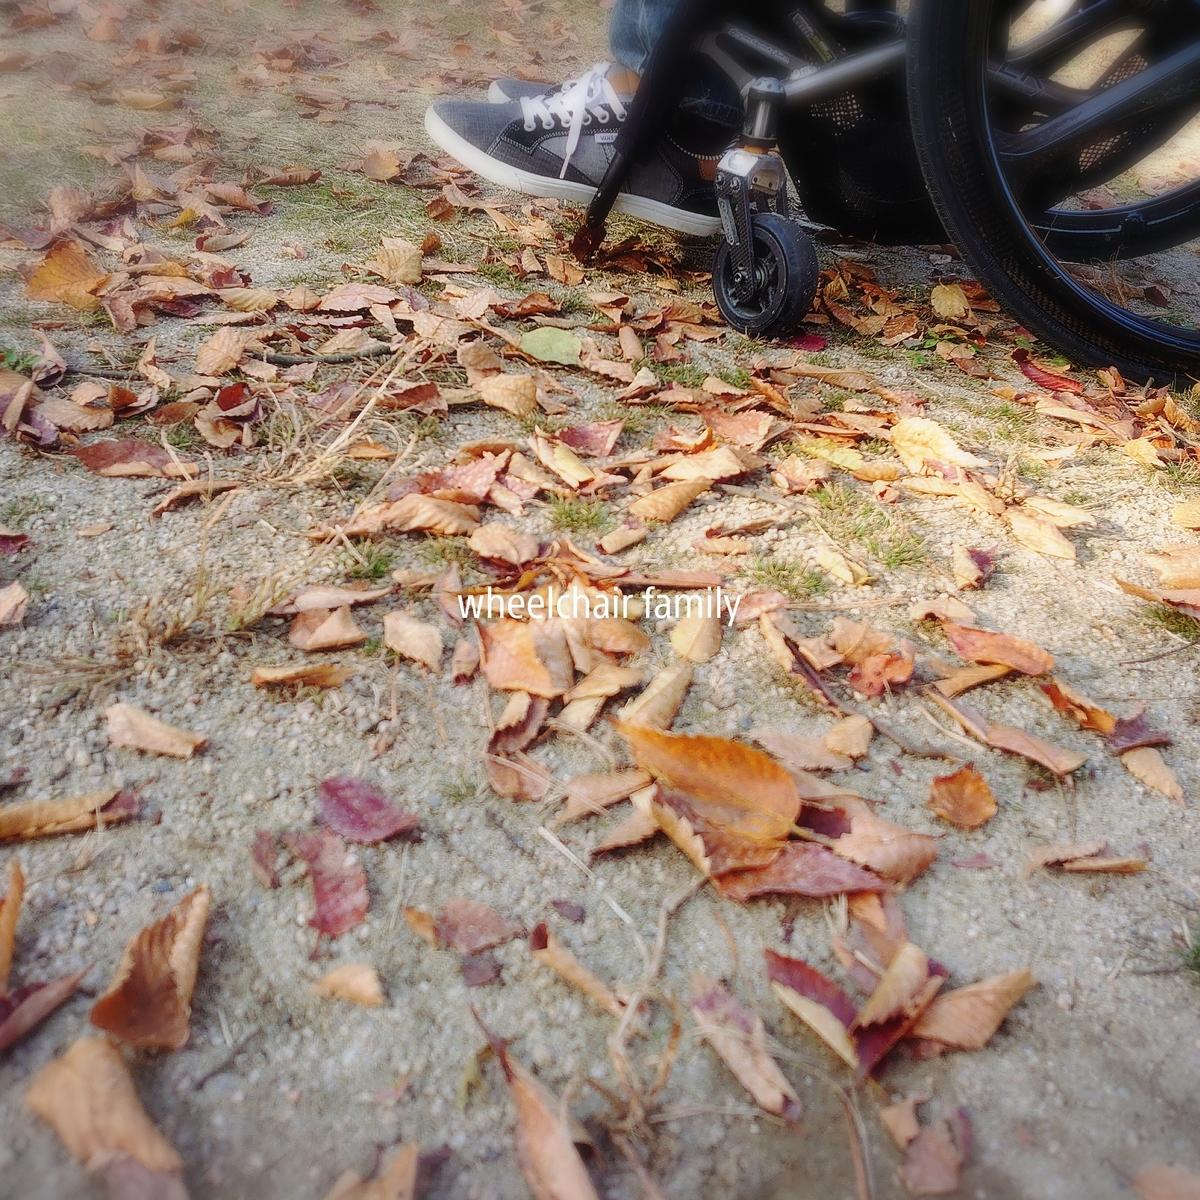 f:id:WheelchairFamily:20201116210944j:plain